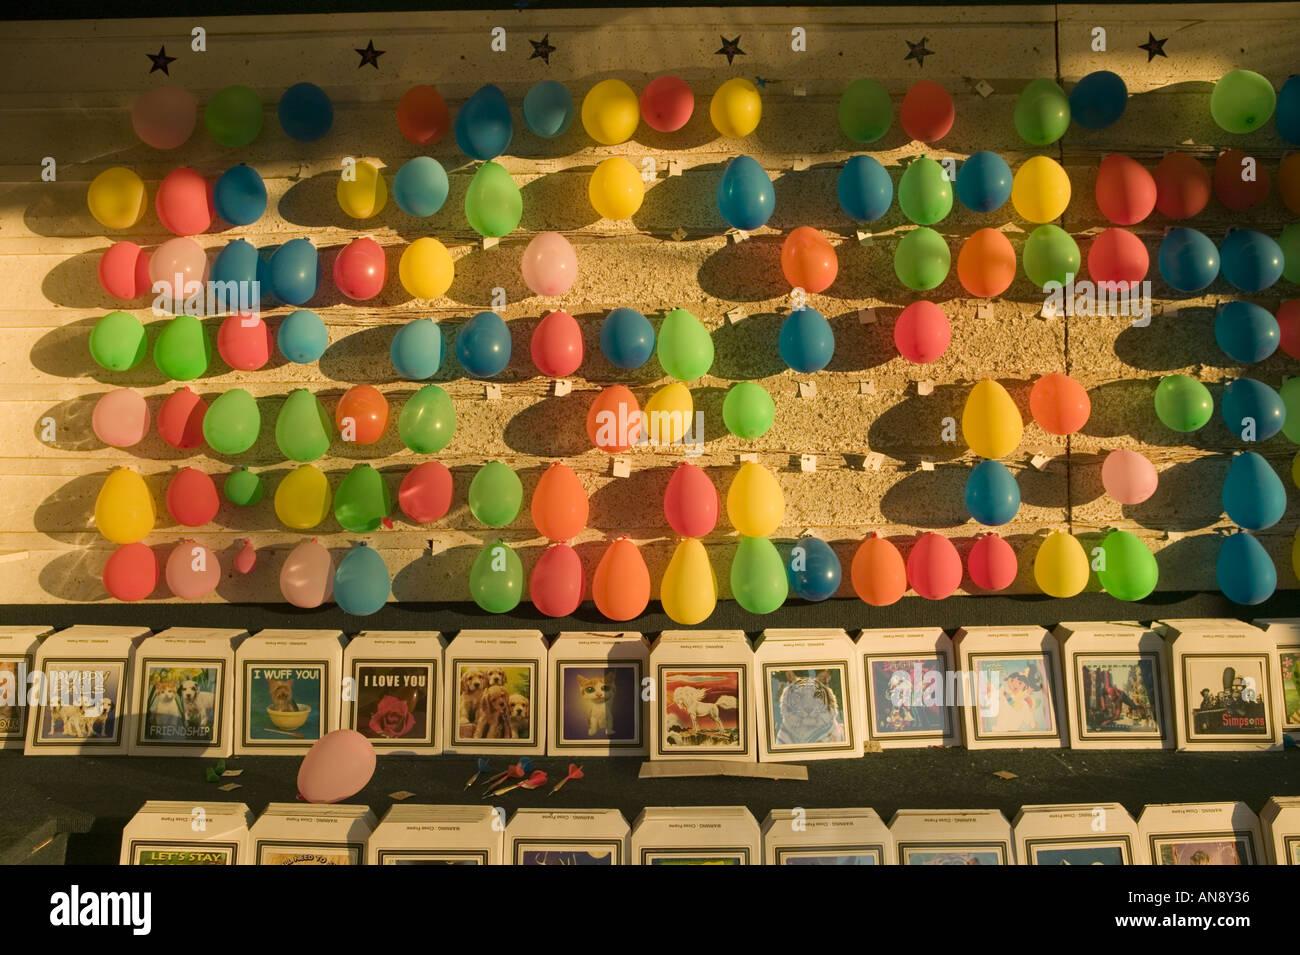 New york montgomery county fonda - Balloon Game Fonda Fair Montgomery County New York